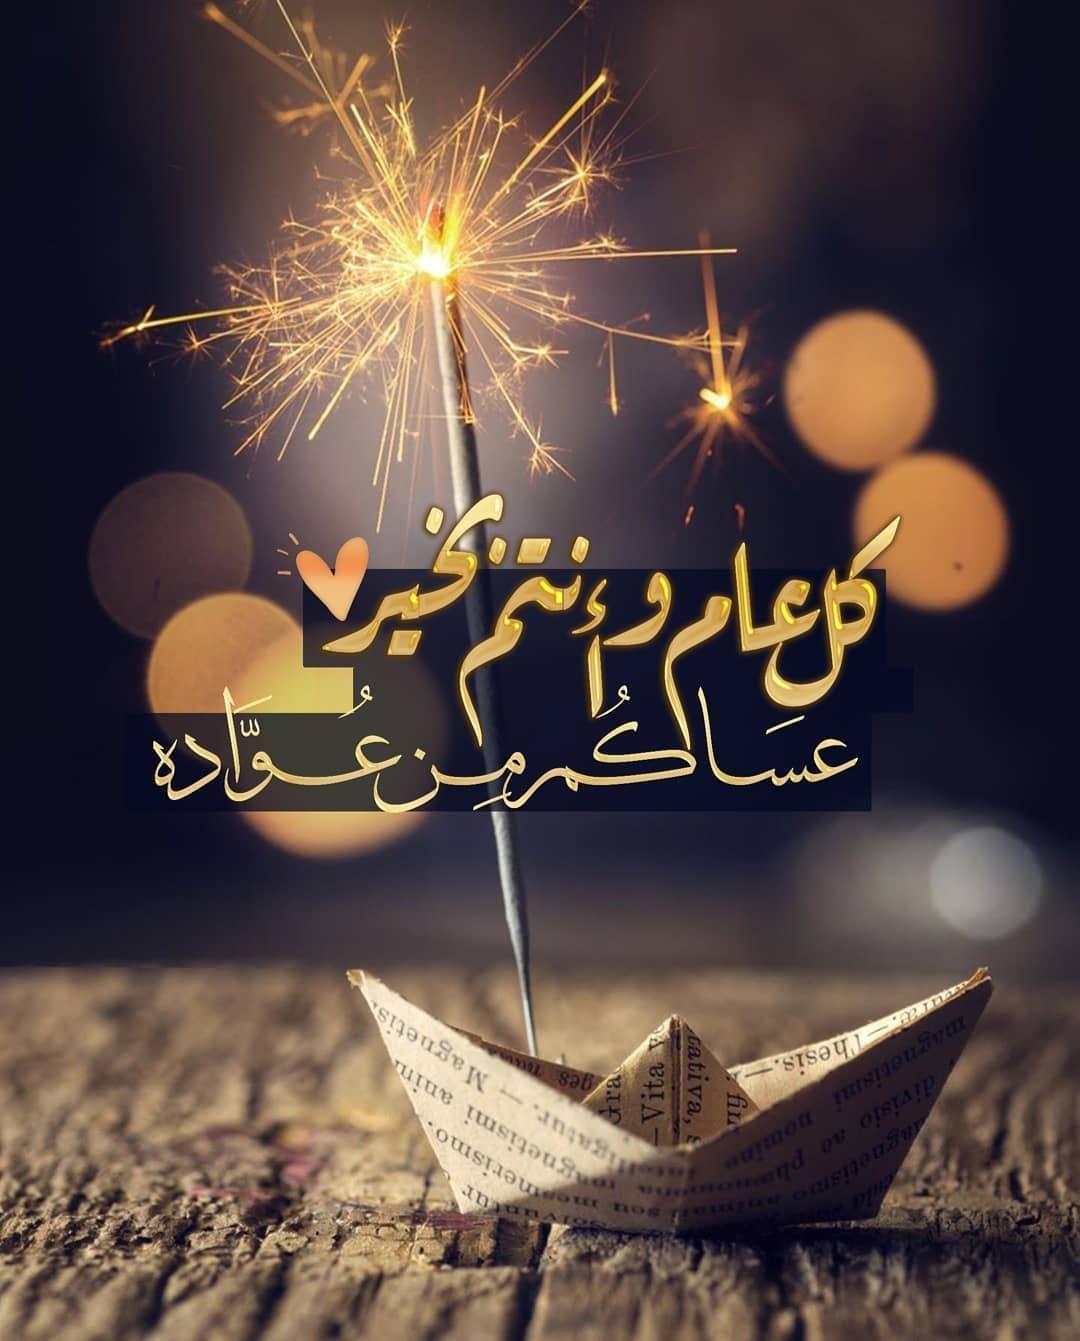 Pin By رغــــــد On عـيـد سعـيــد Eid Cards Ramadan Lantern Place Card Holders